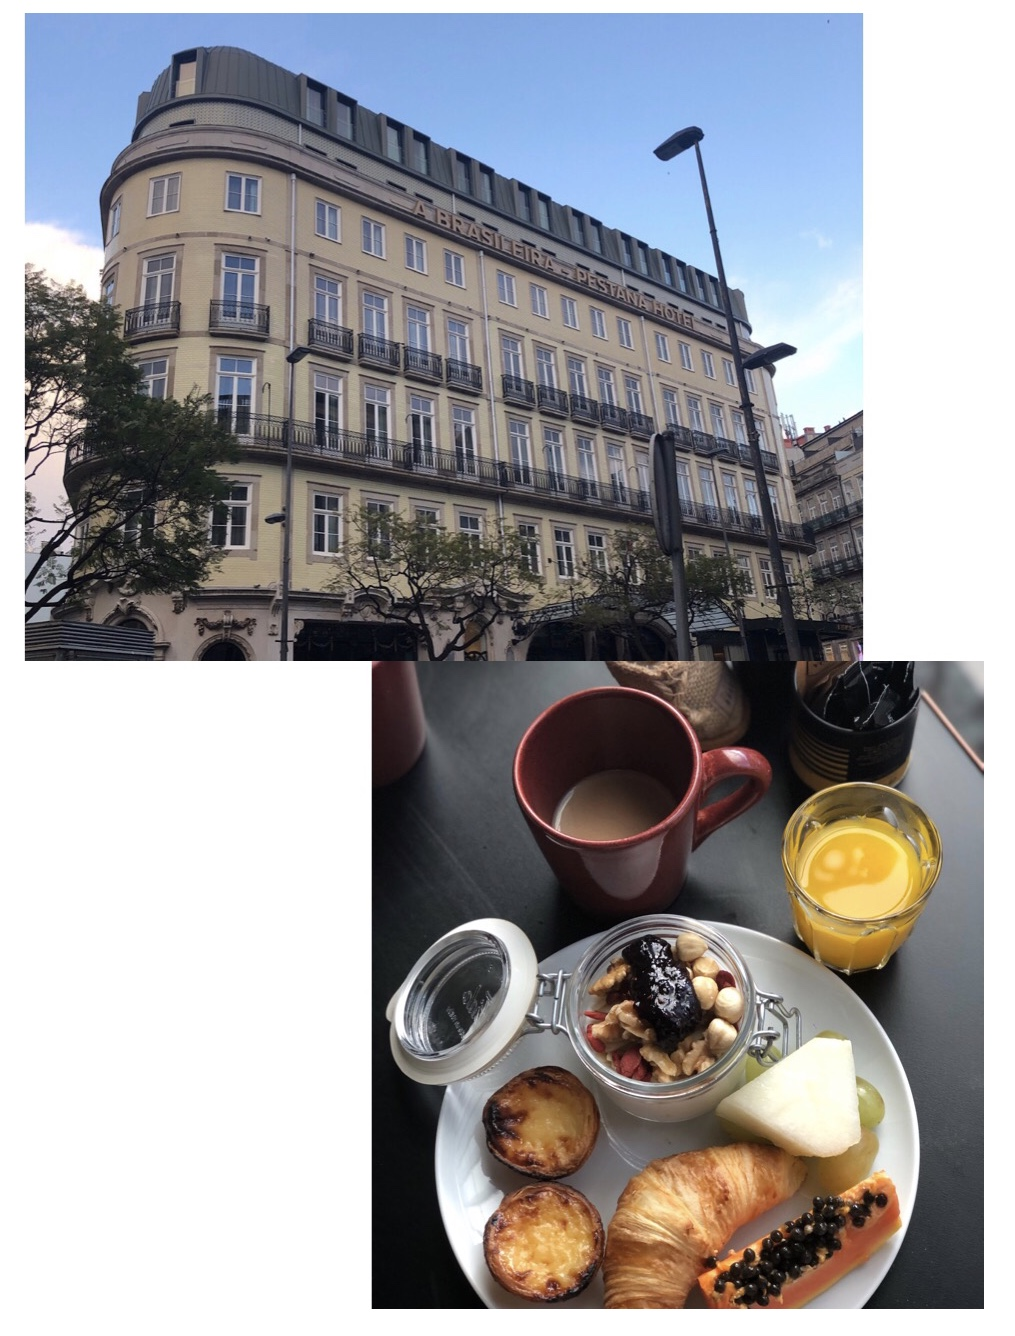 Porto-Reisebericht-Sightseeing-Tipps--Miss-Suzie-Loves